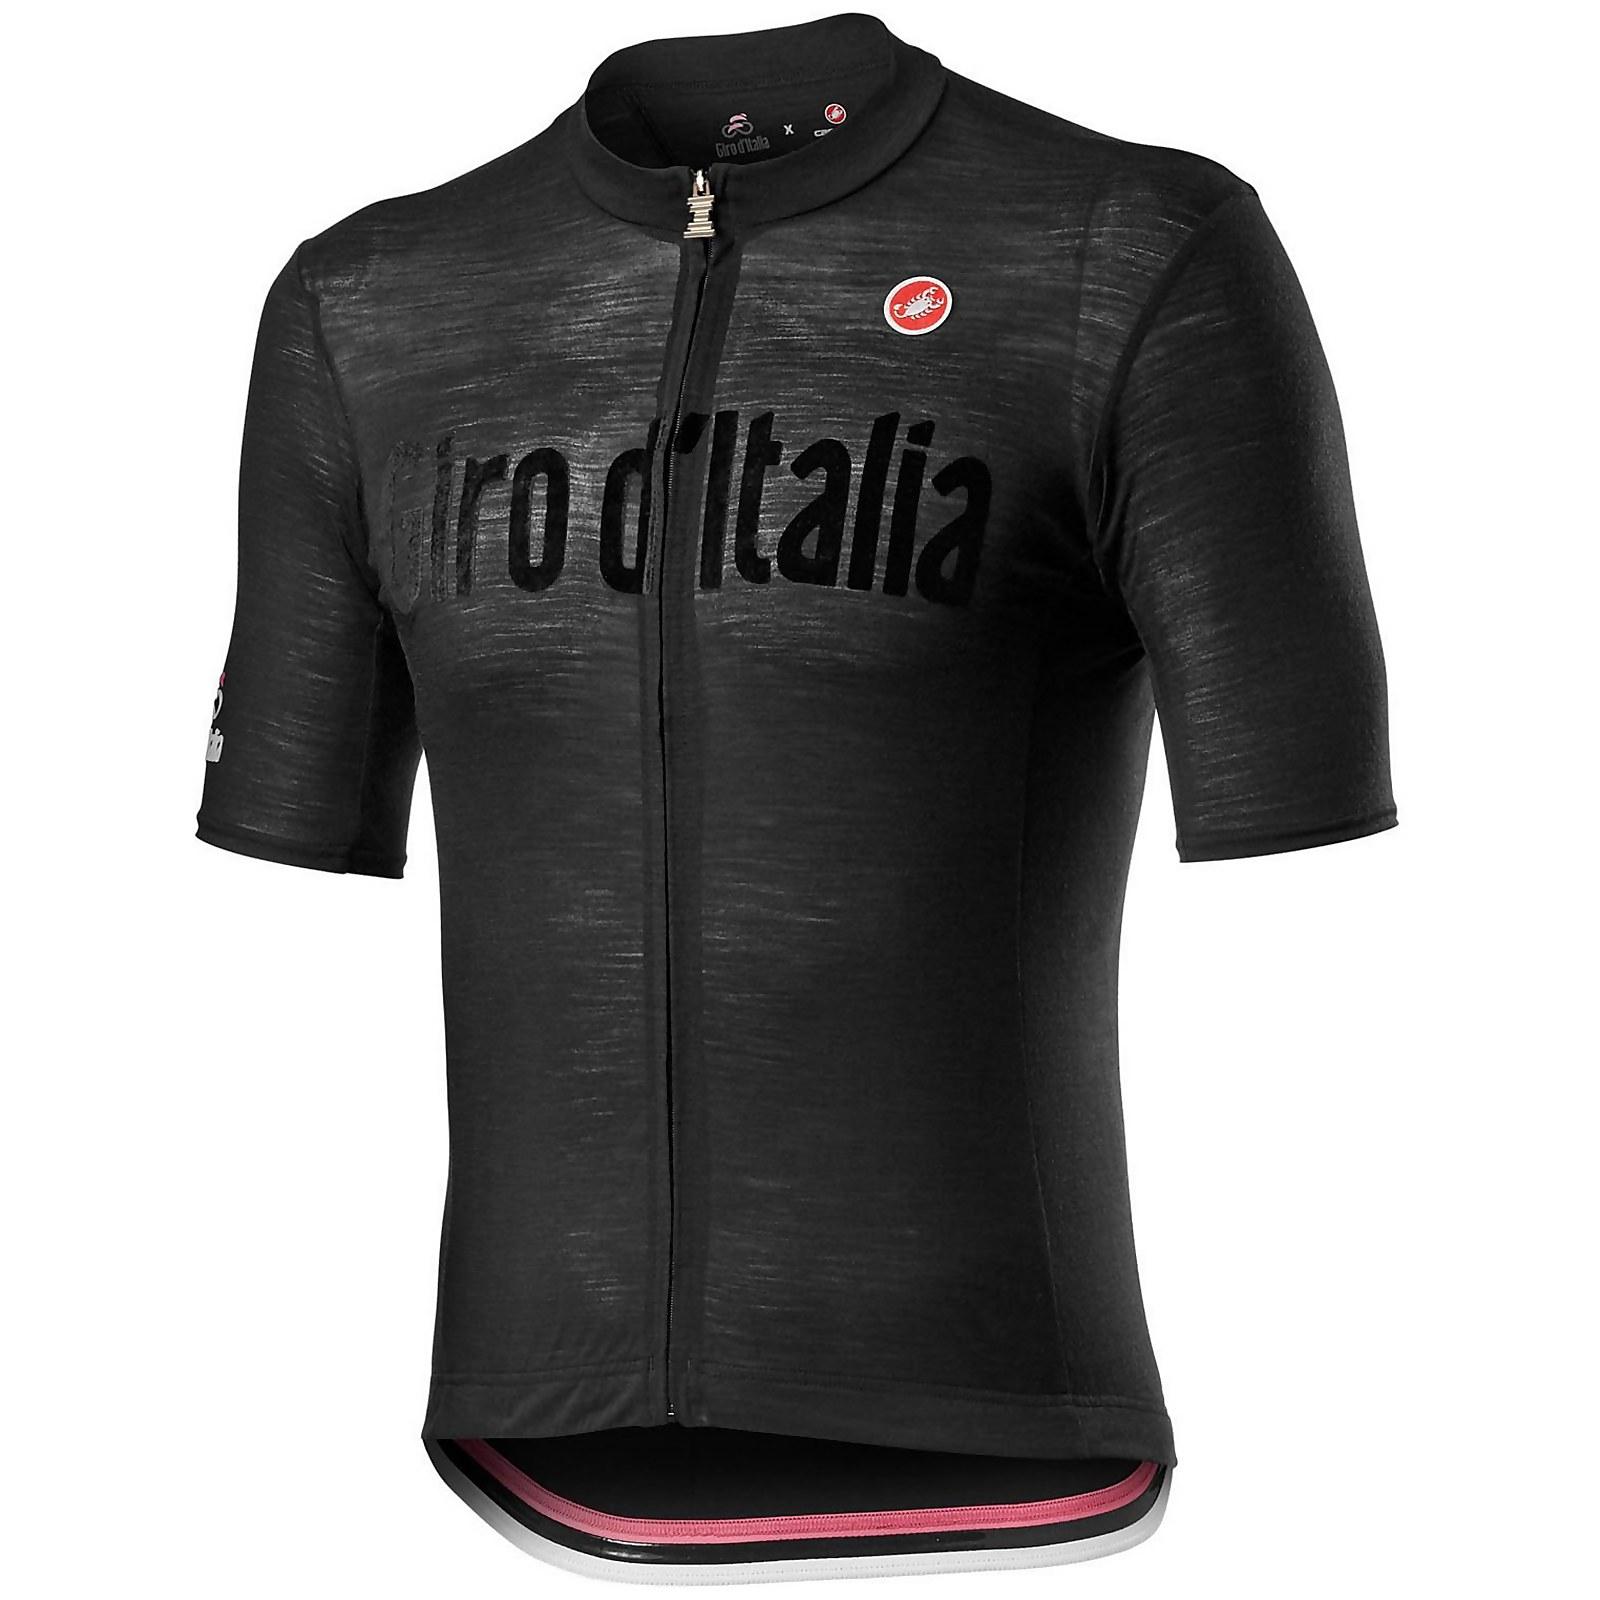 Castelli Giro D'Italia Heritage Maglia Nera Jersey - Nero Vintage - M